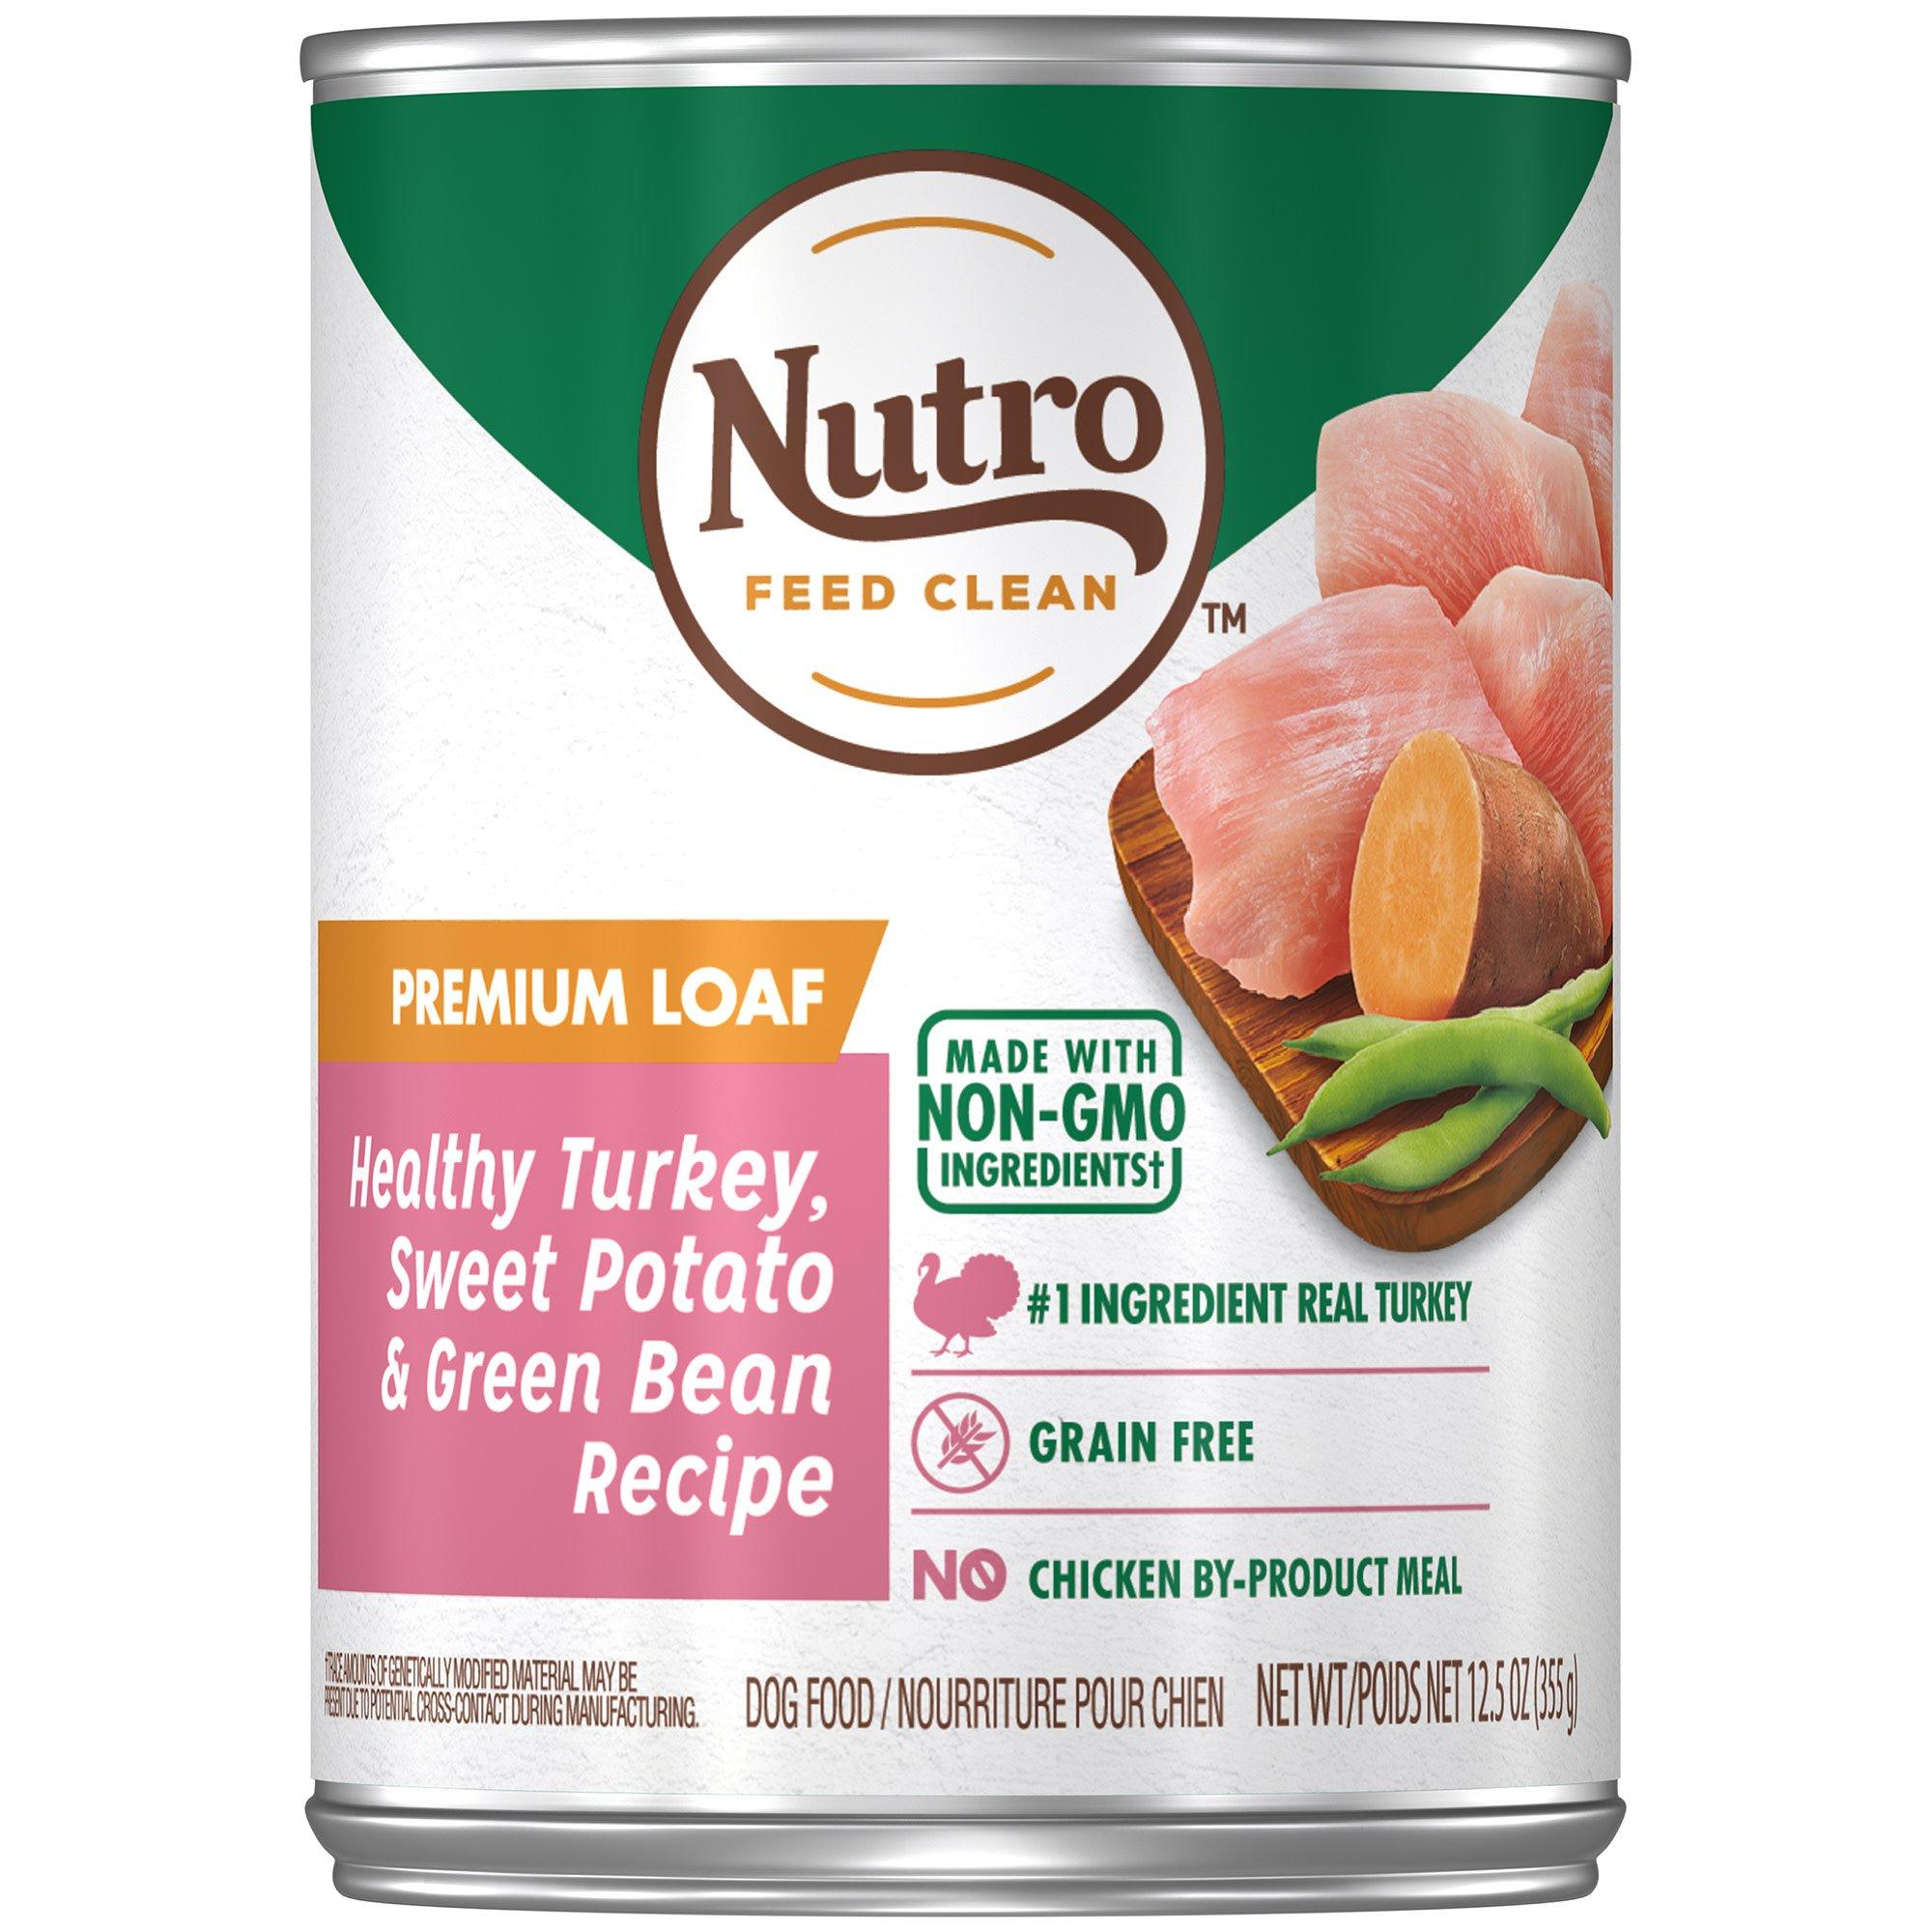 Nutro Roasted Turkey & Rice Senior Canned Dog Food